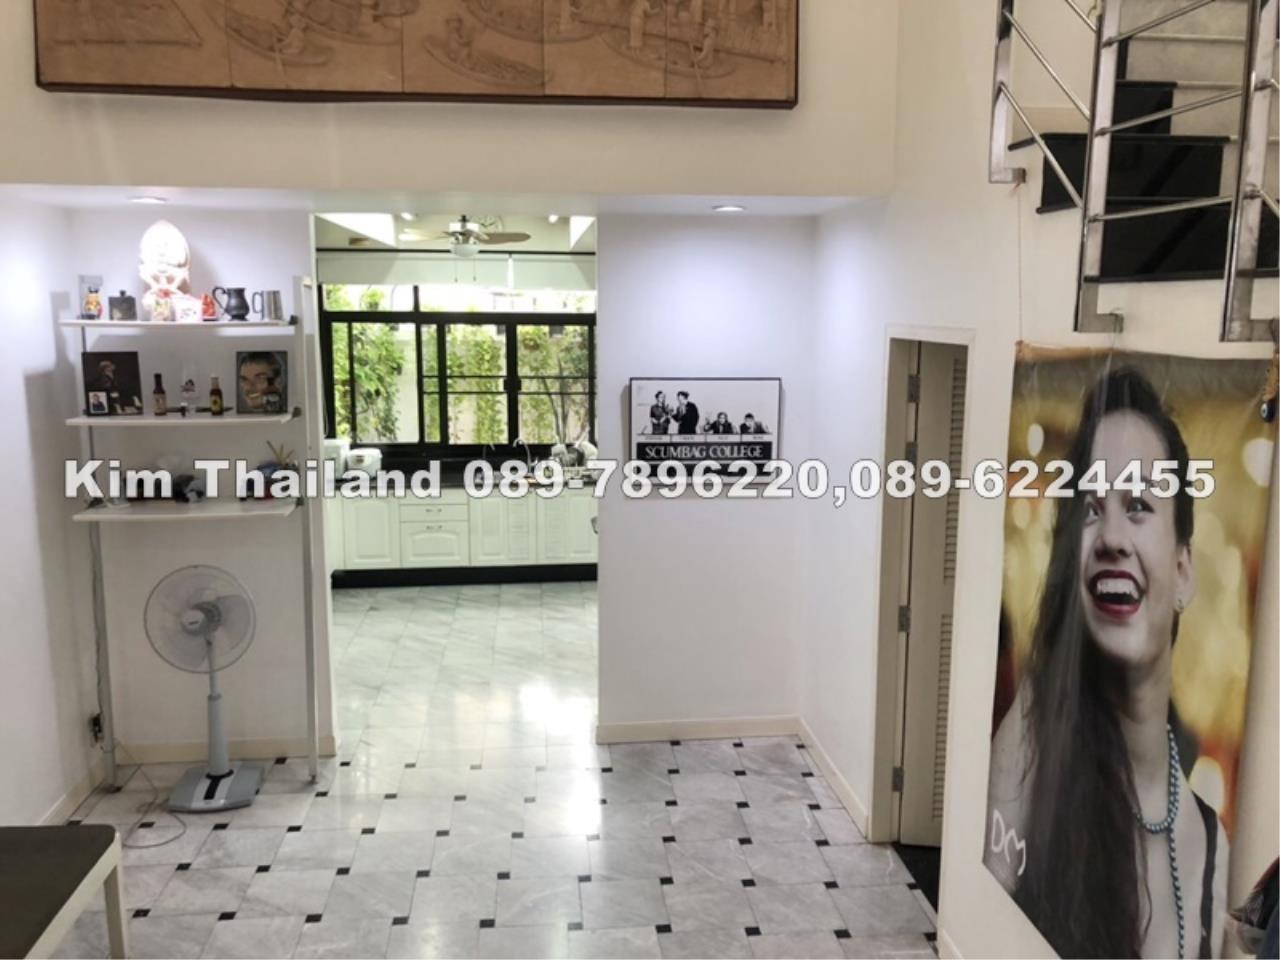 Kim Thailand Agency's ขายทาวน์เฮ้าส์ 4 ชั้น ย่านสุขุมวิท71 พื้นที่ 29.9 ตารางวา 4 ห้องนอน ขาย 15.7 ล้านบาท 9